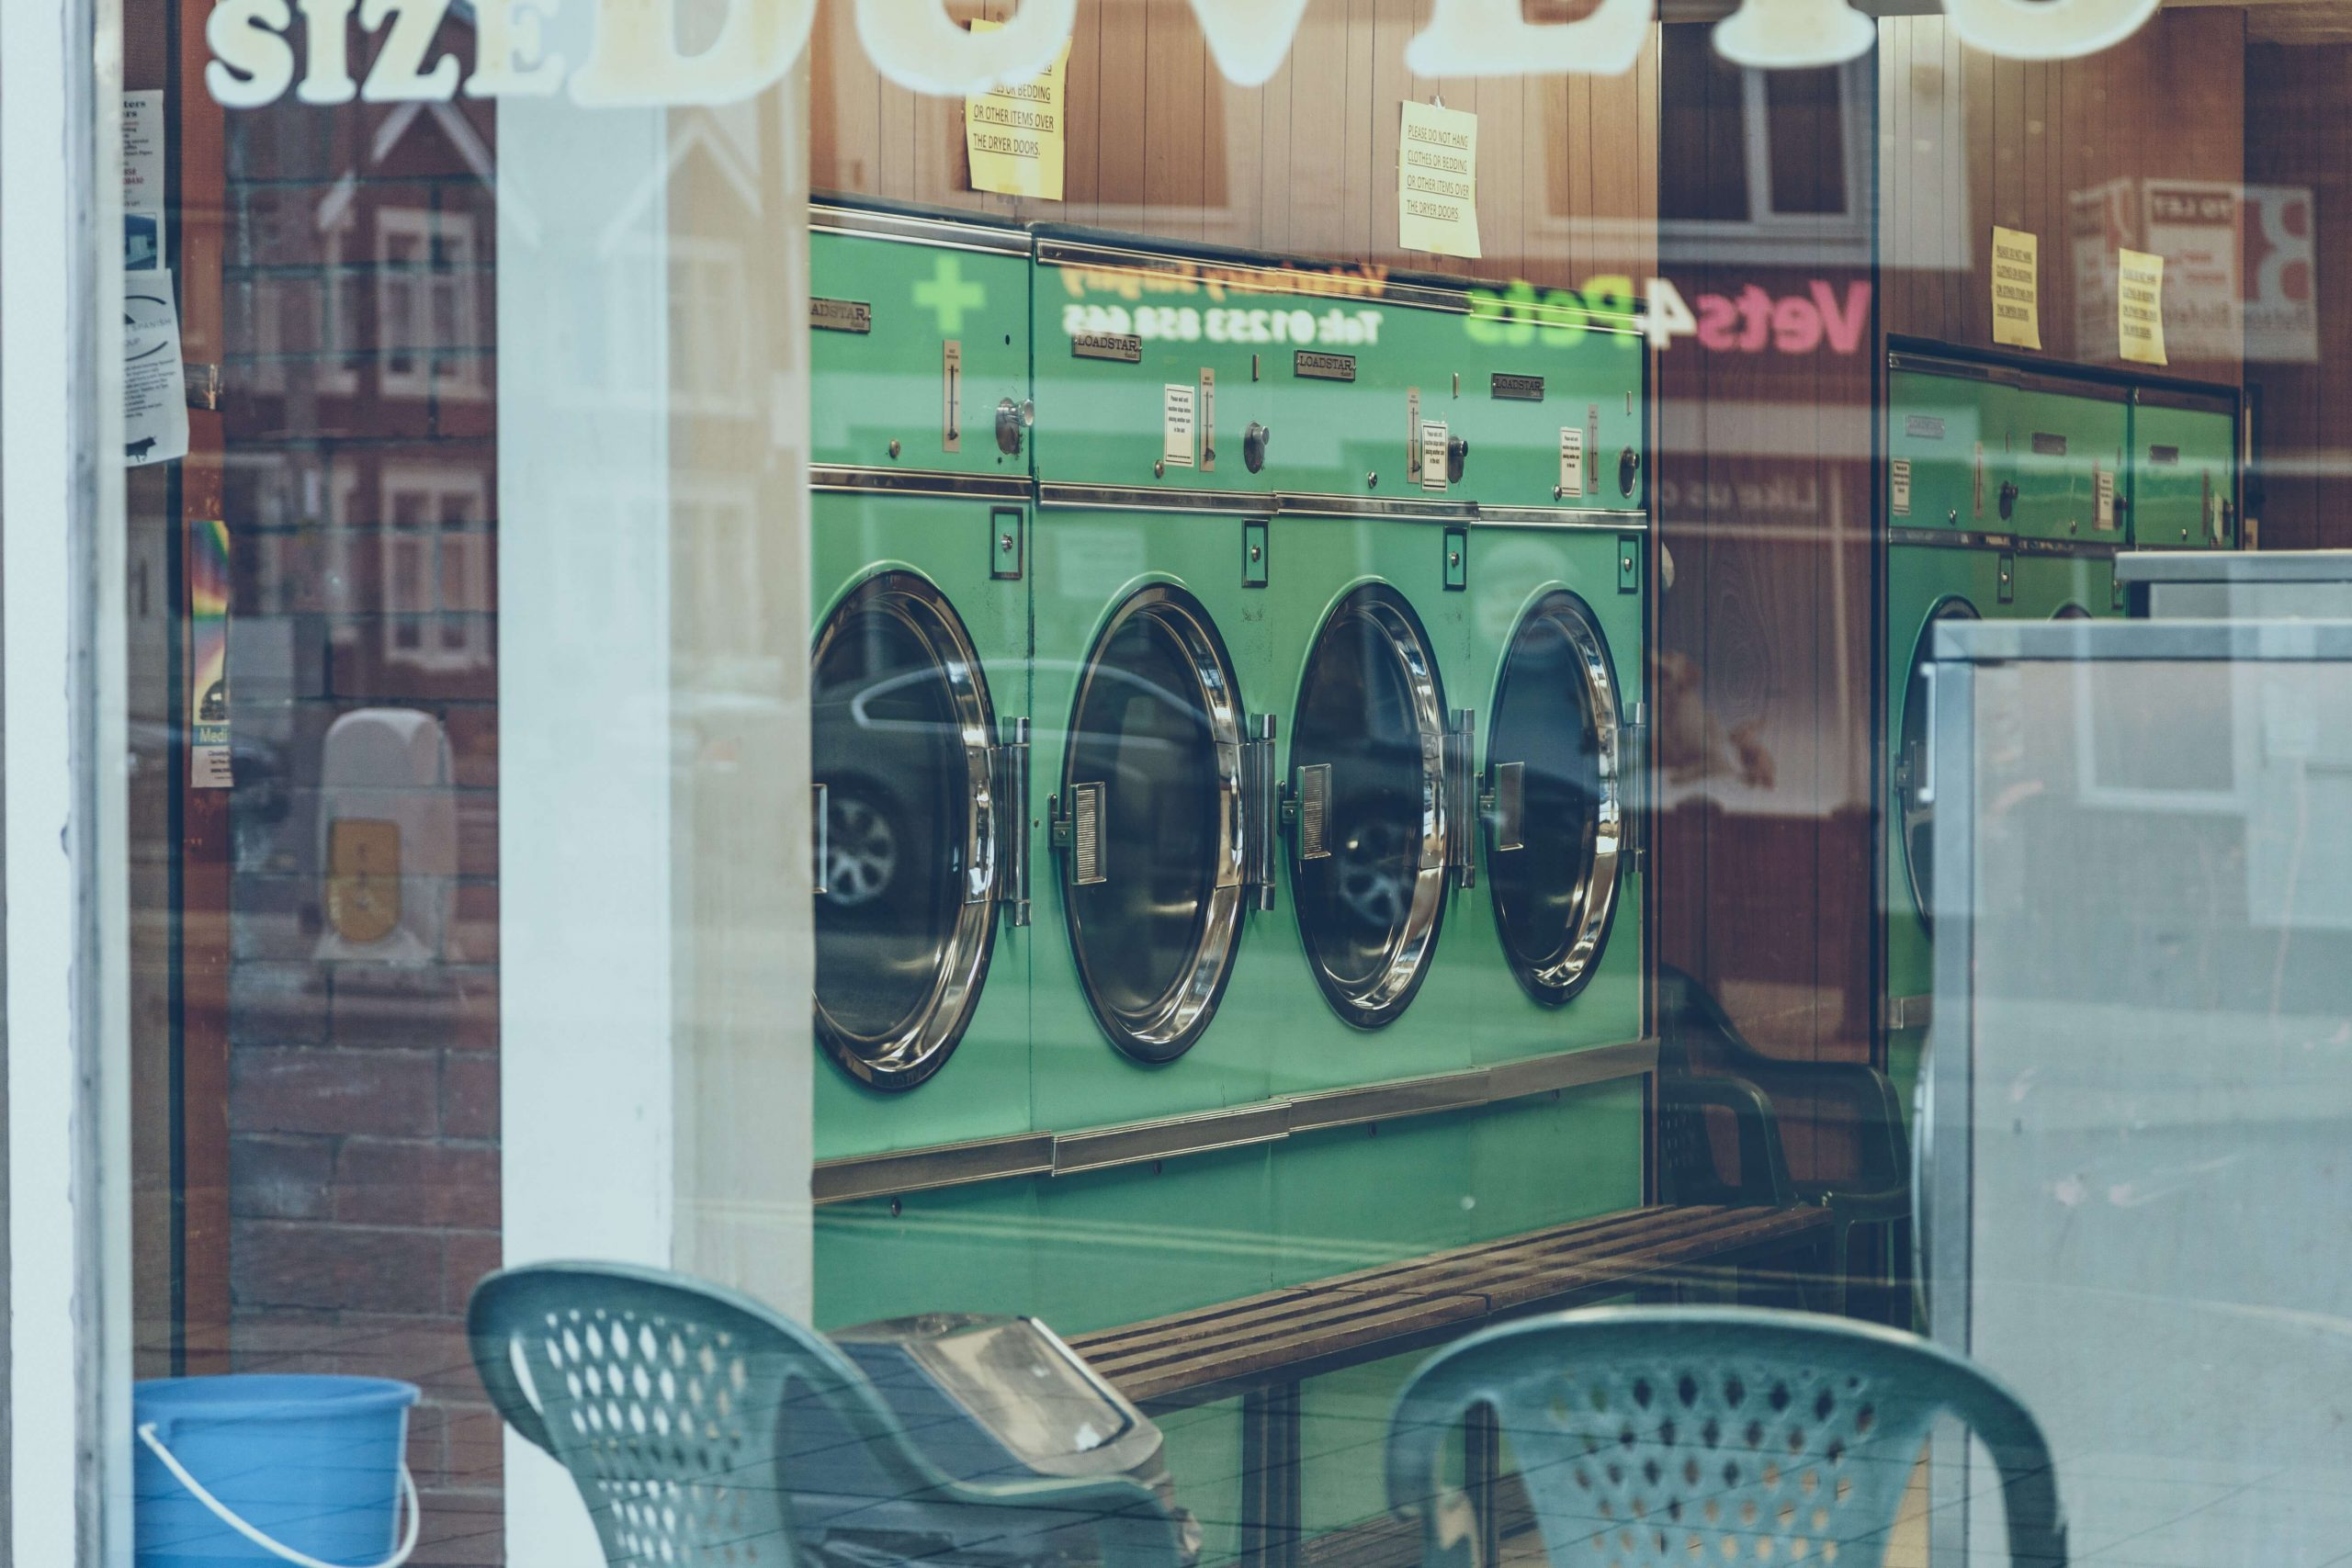 Atlantic Laundry Dry Cleaning Coin Laundry Laundry Kiloan